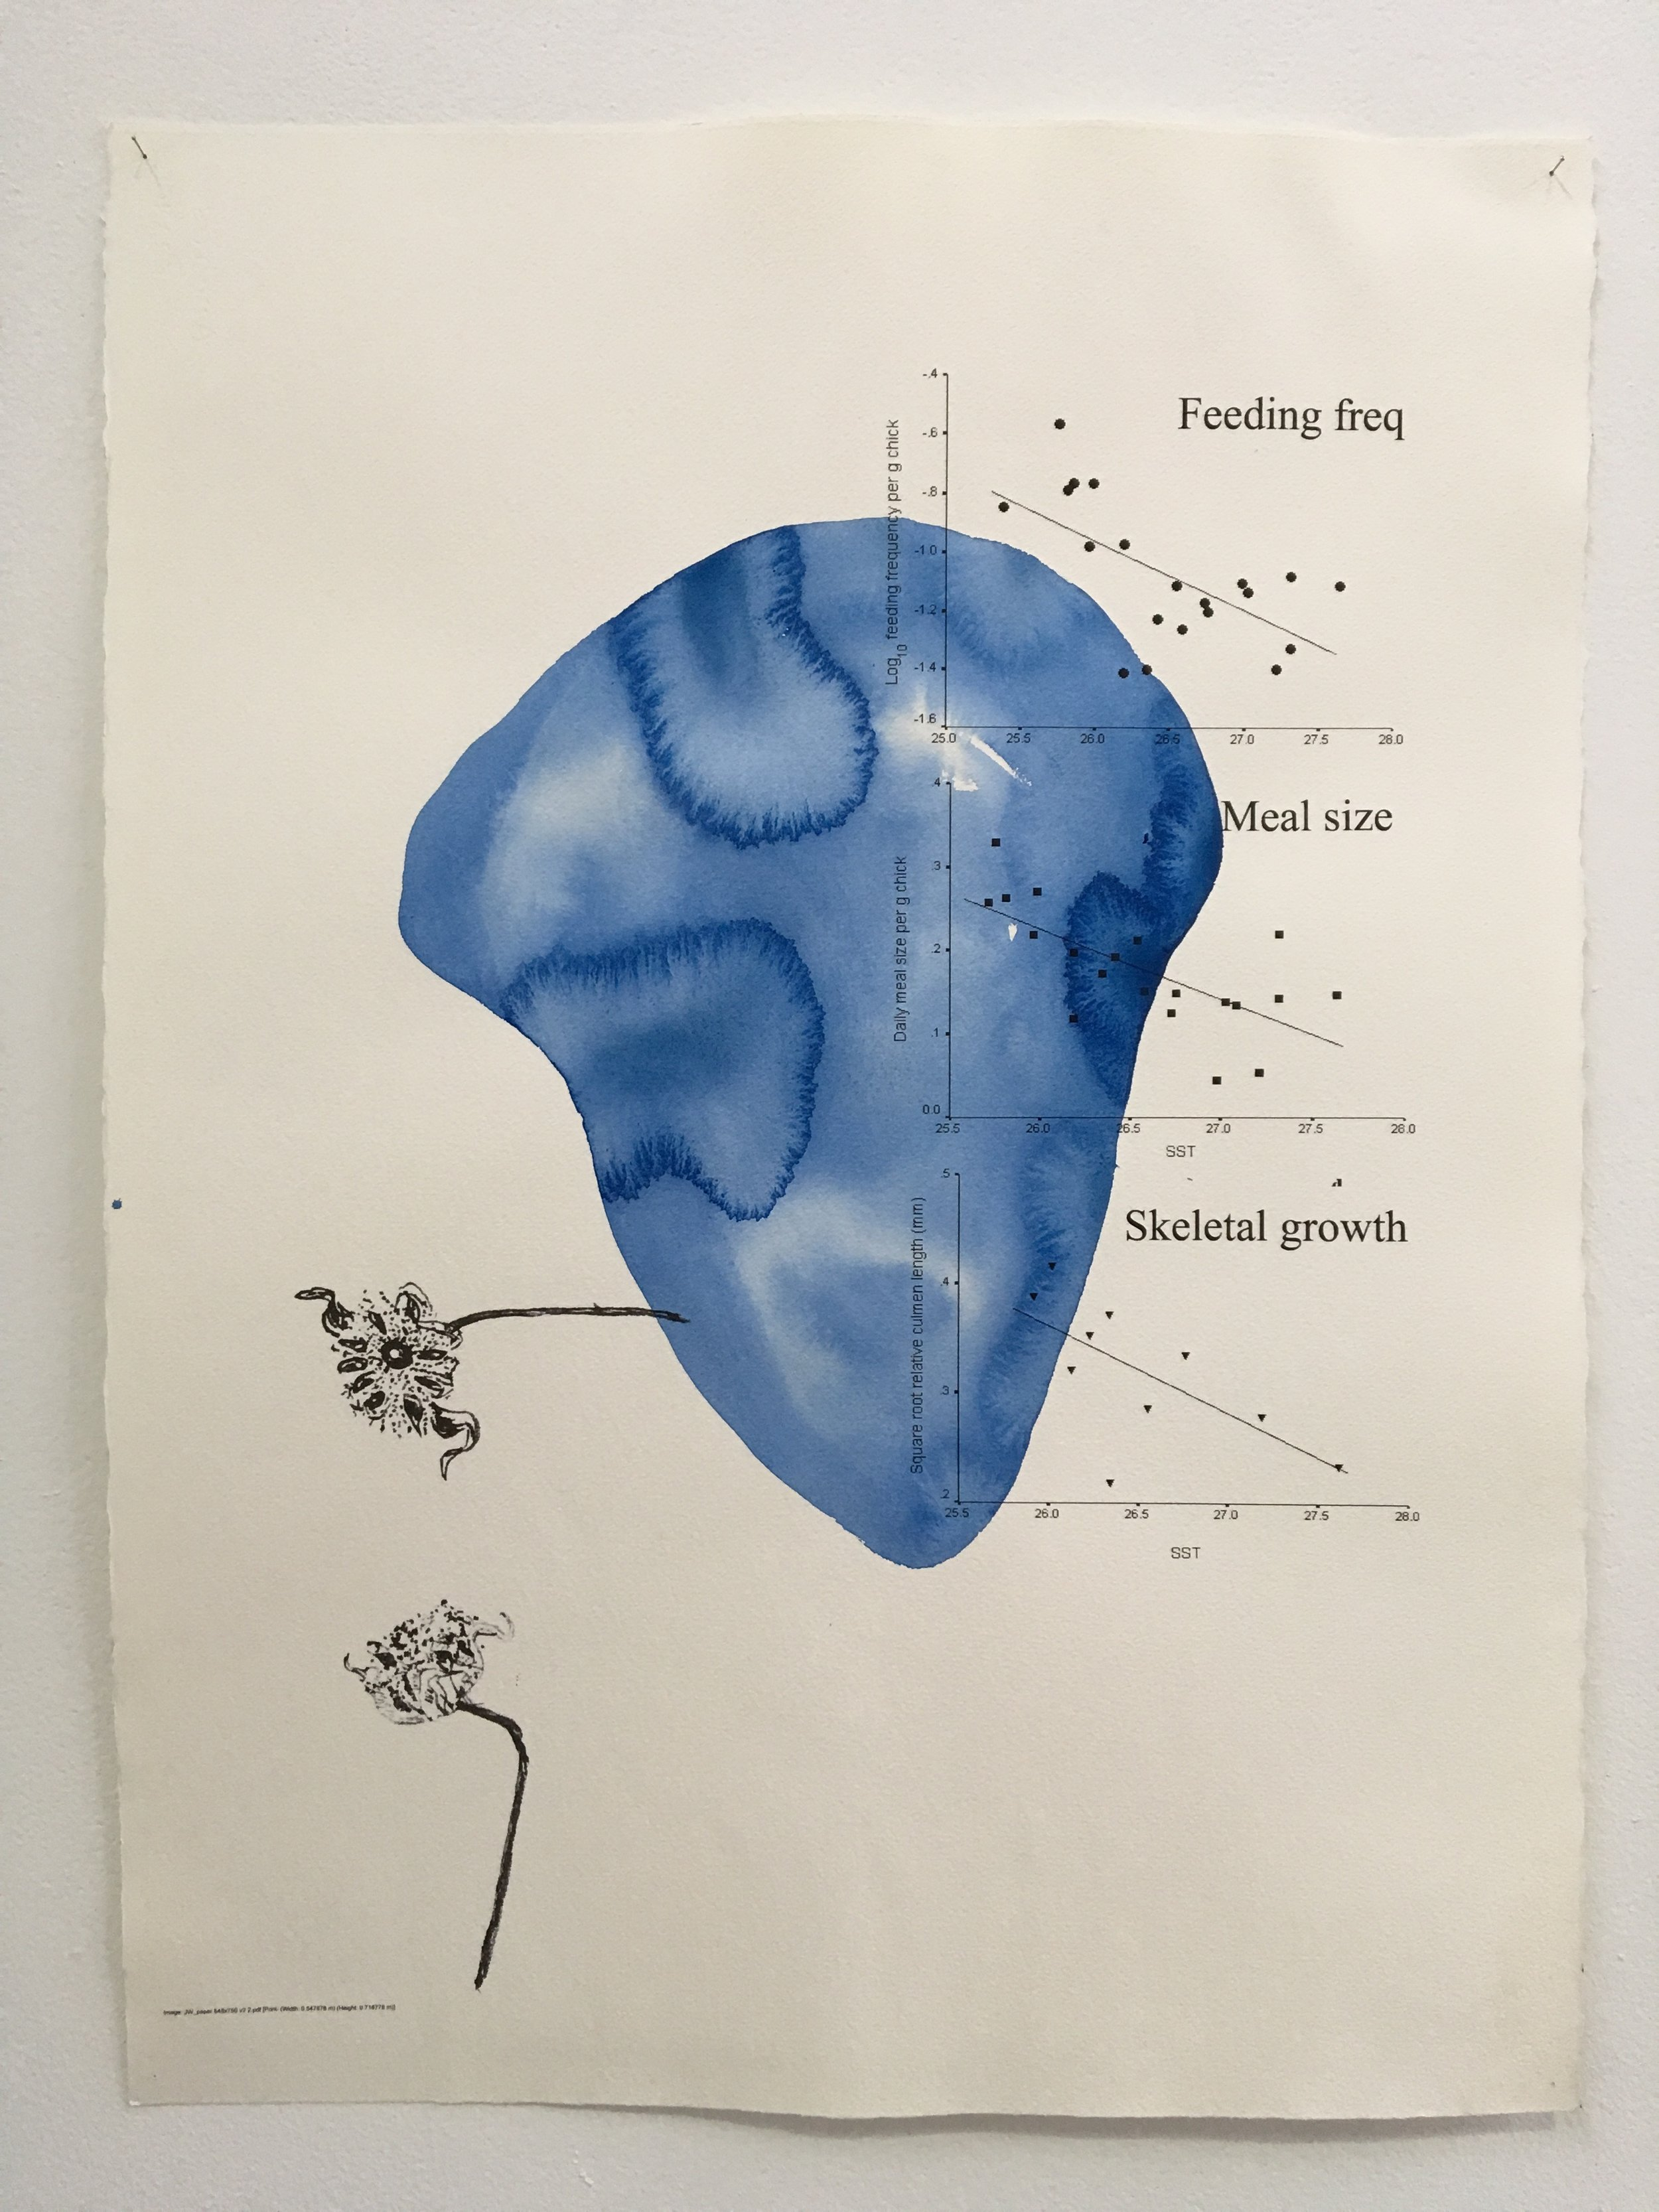 Judy Watson heron island 1 2009-16 acrylic and digital print on paper 77 x 57 cm.jpg